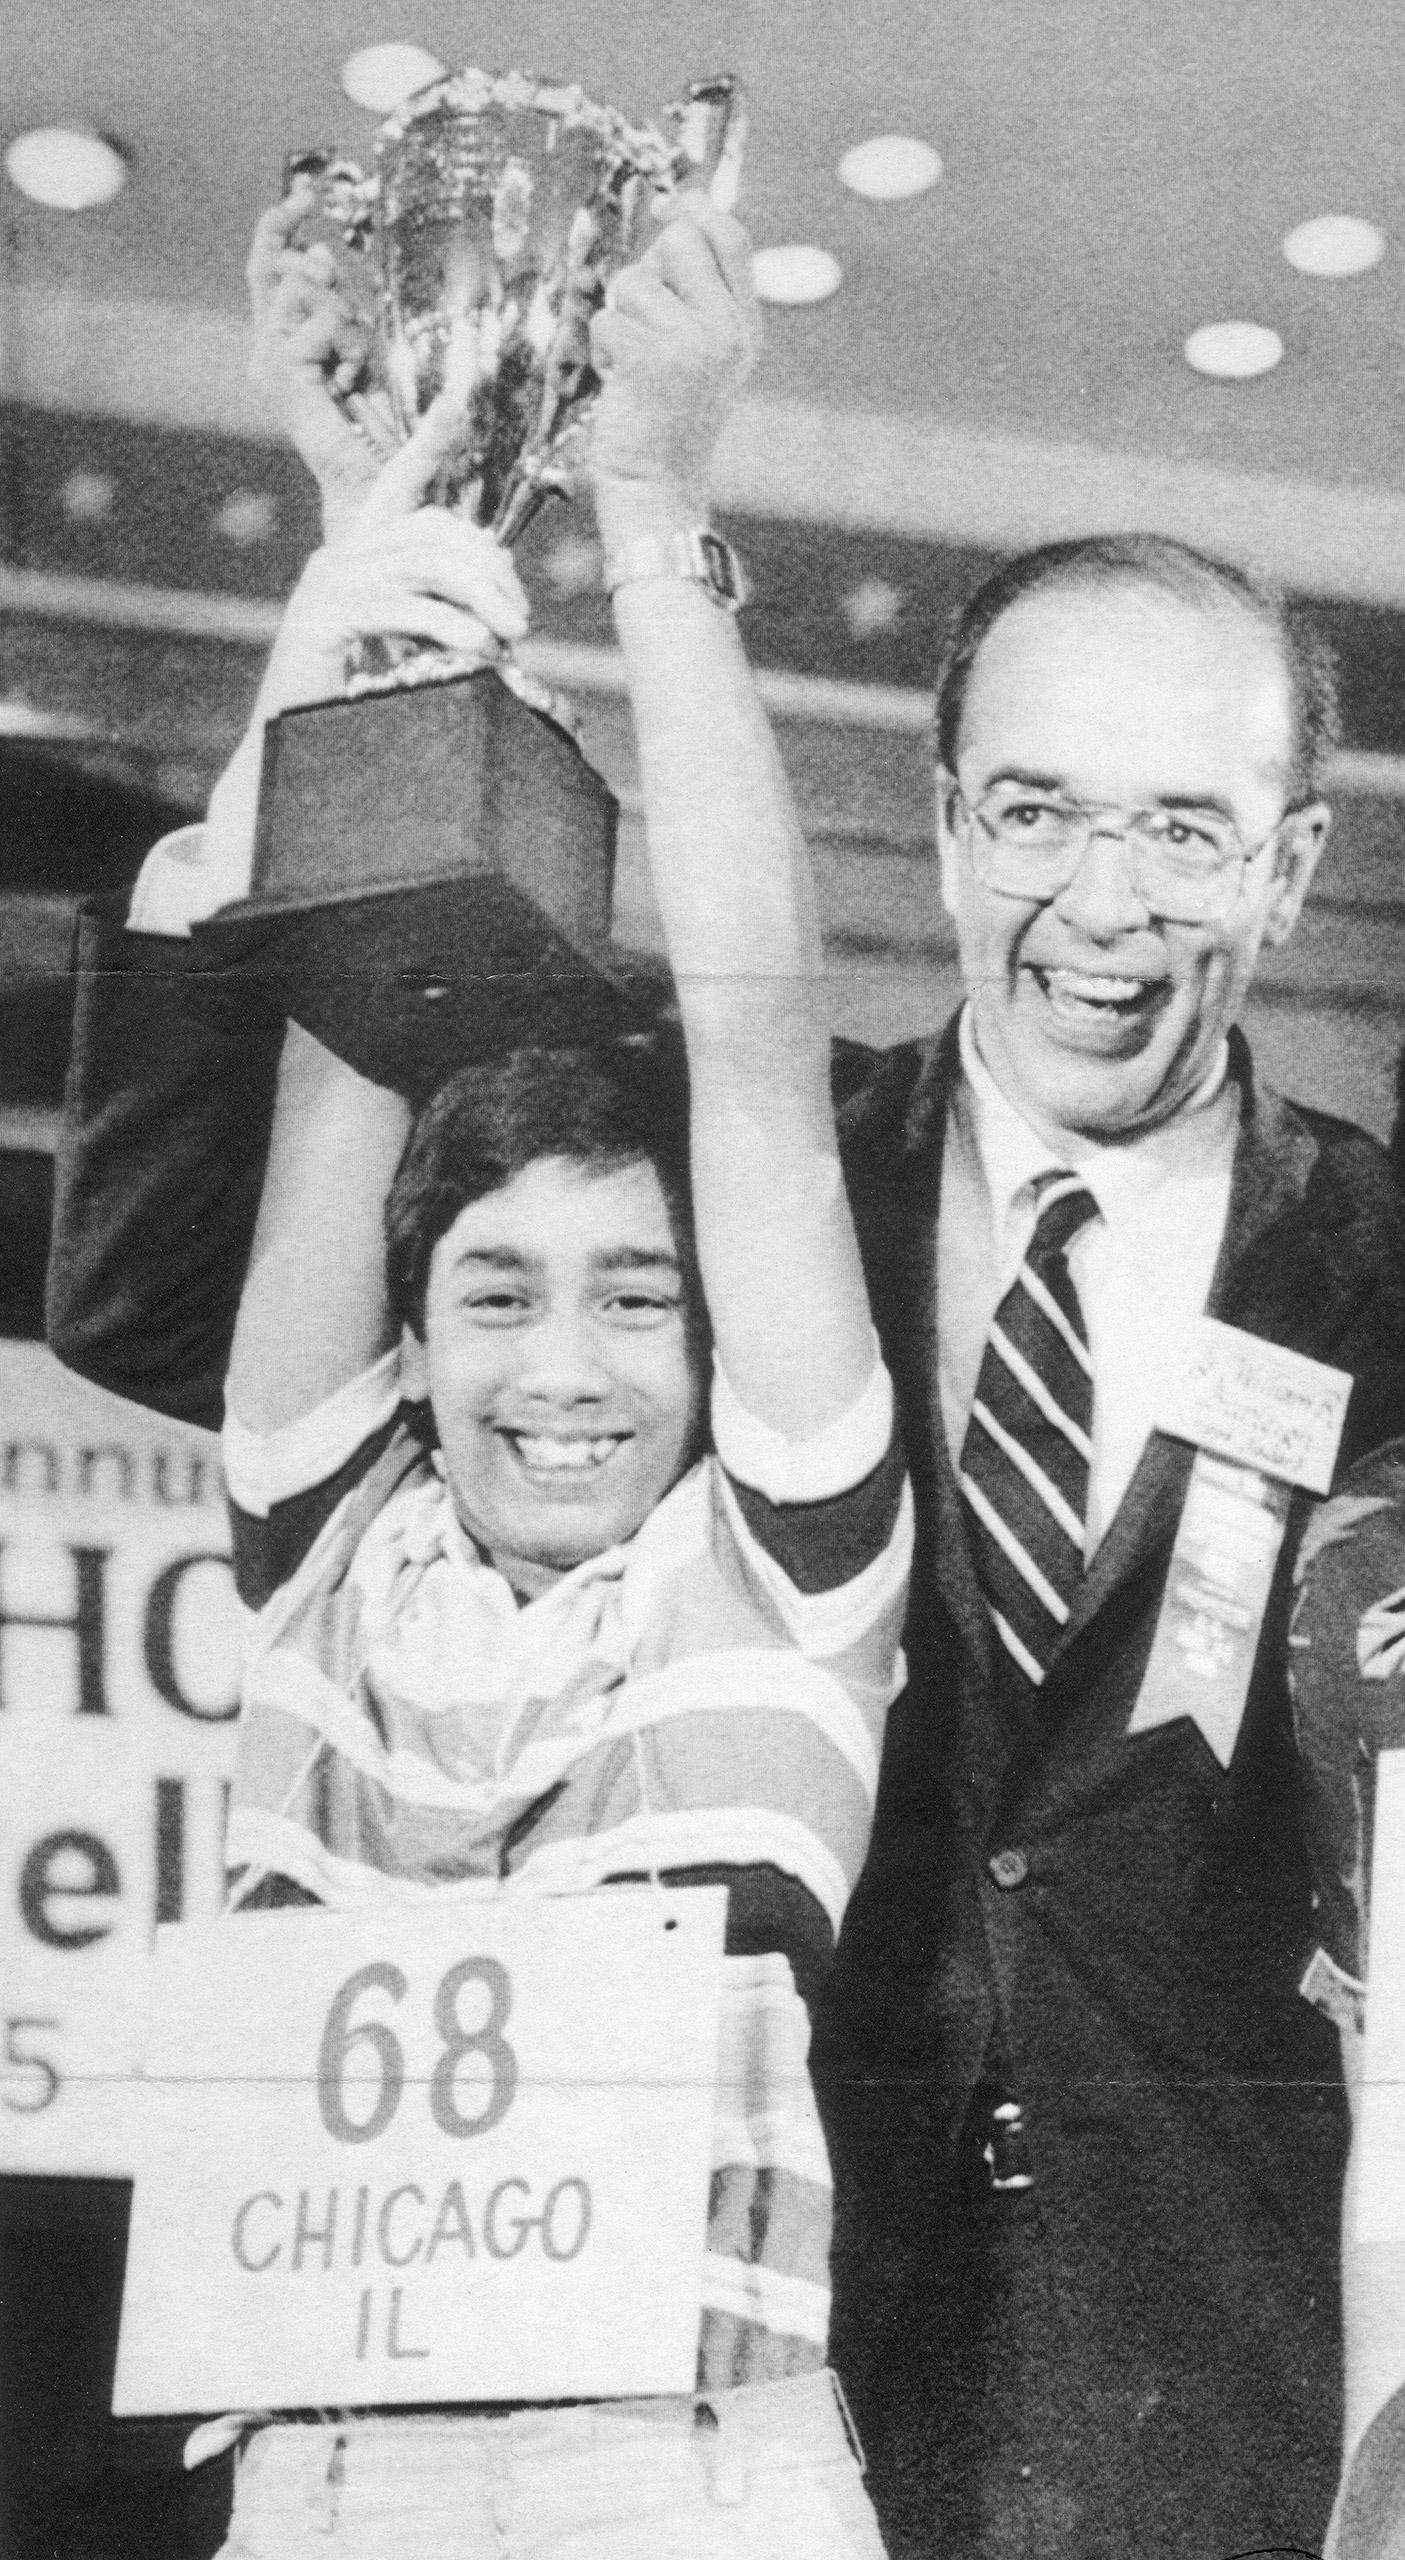 1985 Scripps National Spelling Bee champion Balu Natarajan.